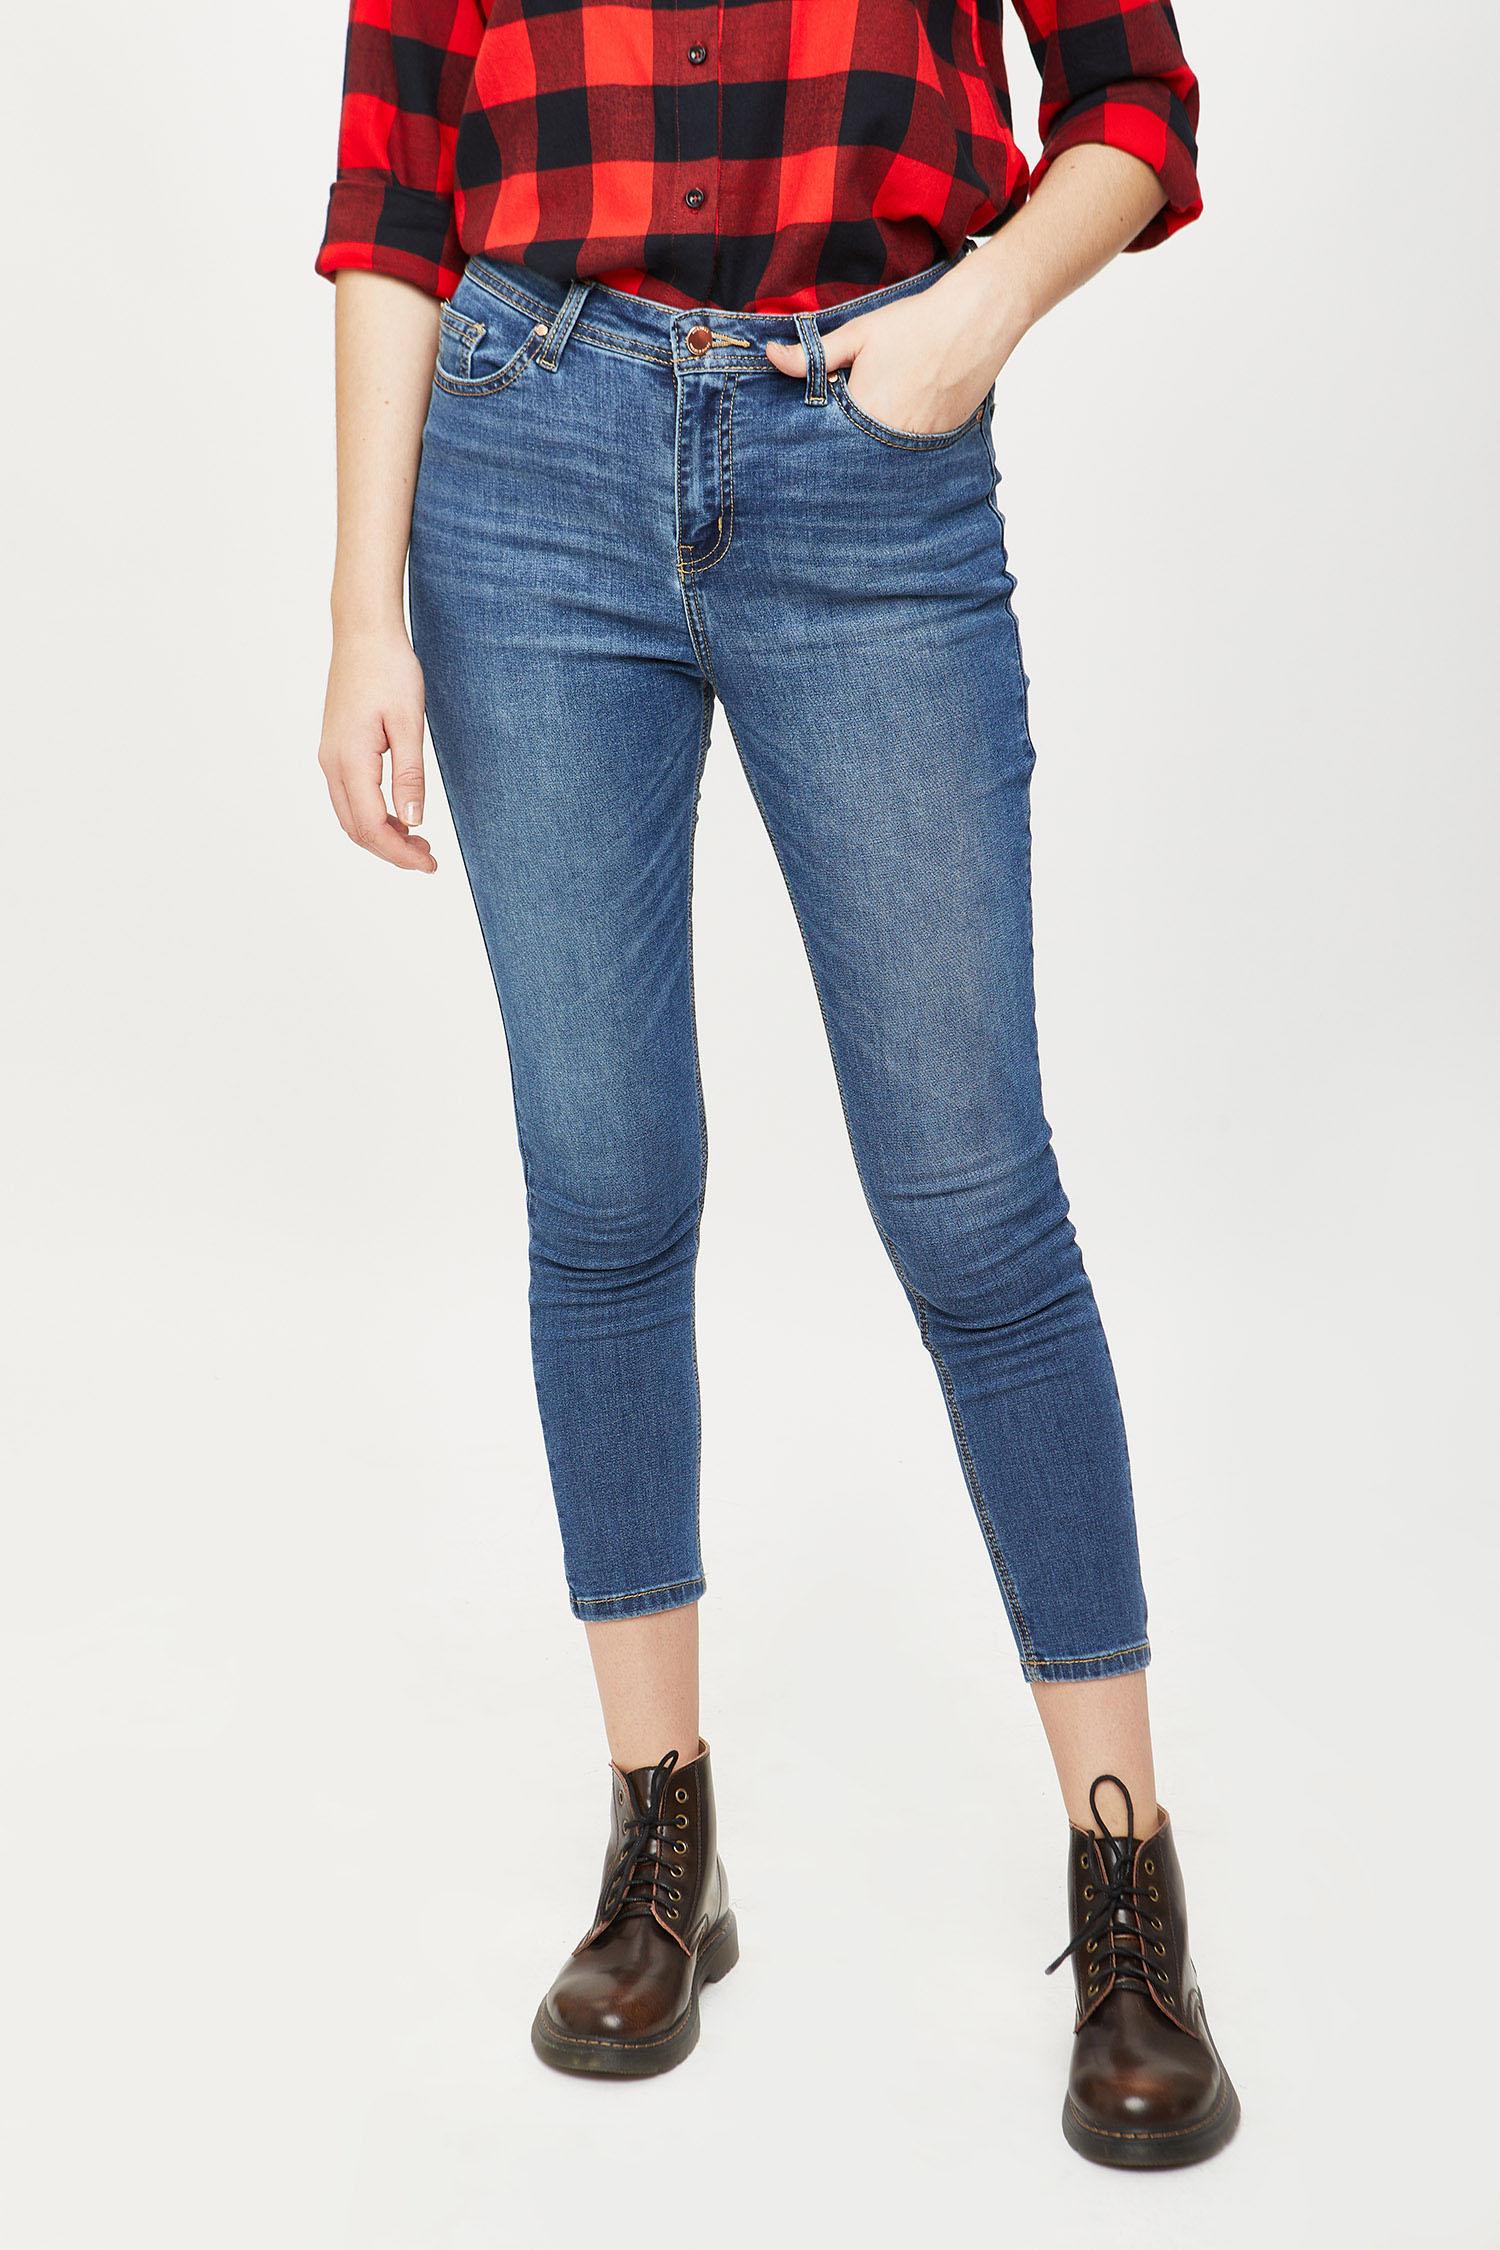 quần jean nữ - 1907002